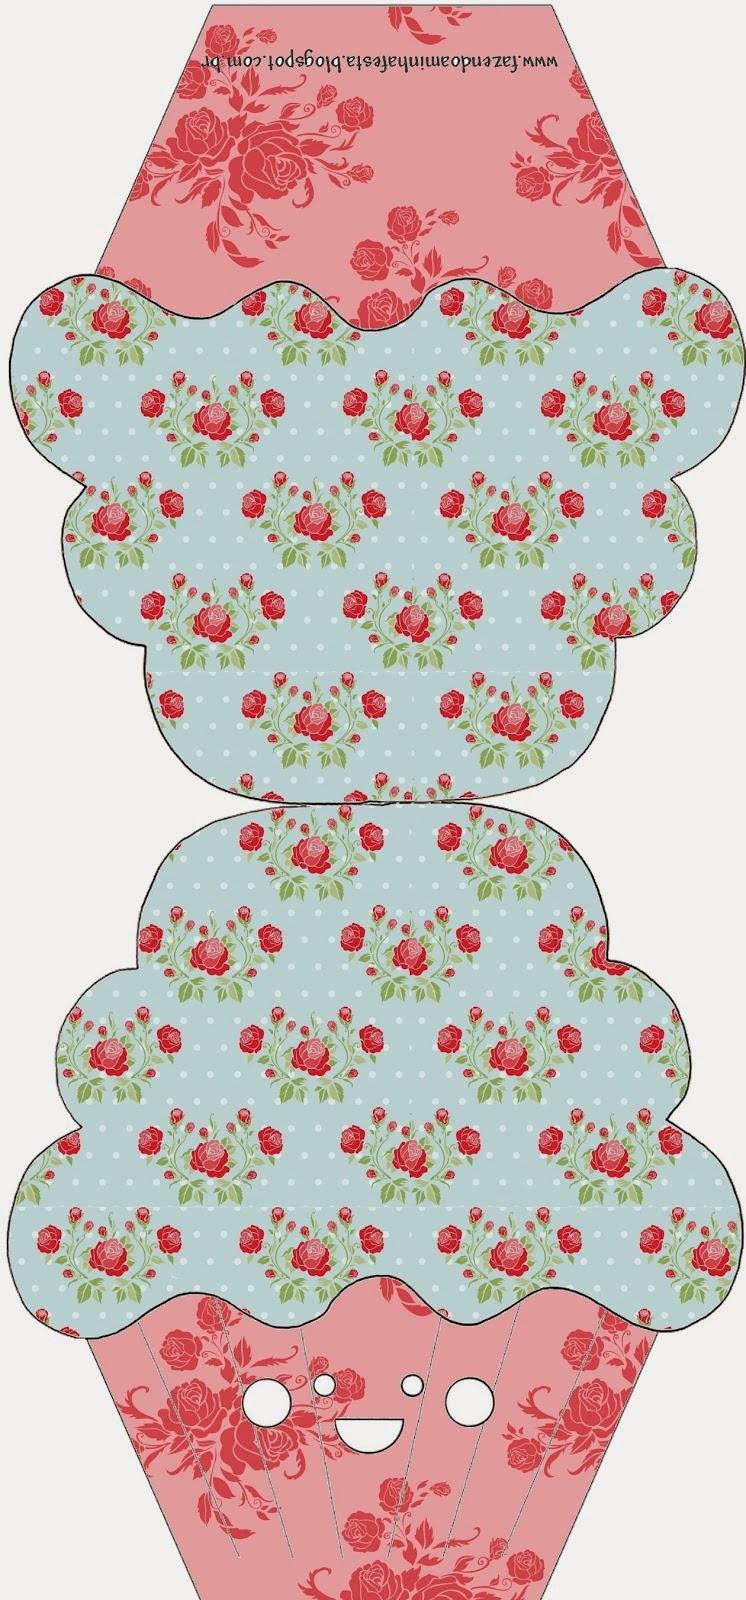 Tarjeta con forma de cupcake de Shabby Chic de Rosas Rojas en Fondo Celeste